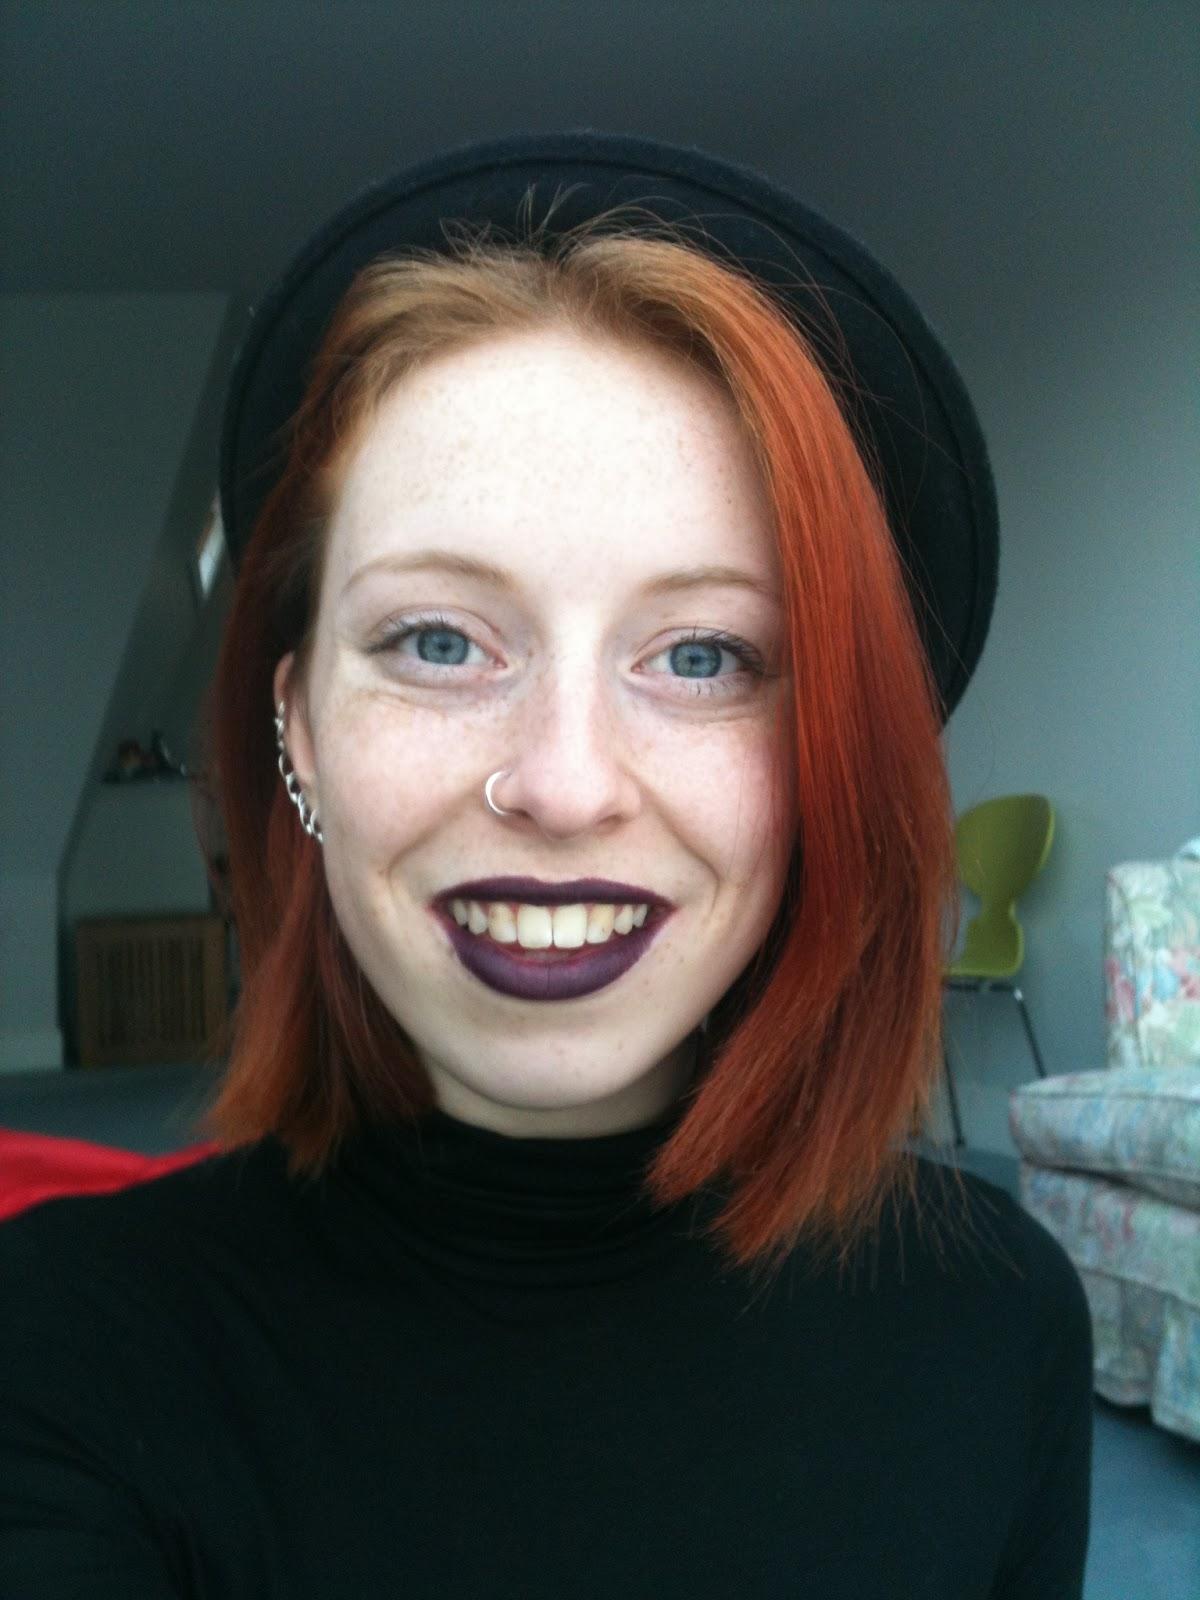 Connu Lipstick Fantasy: Mac Dark Lipsticks Haul! ZU51